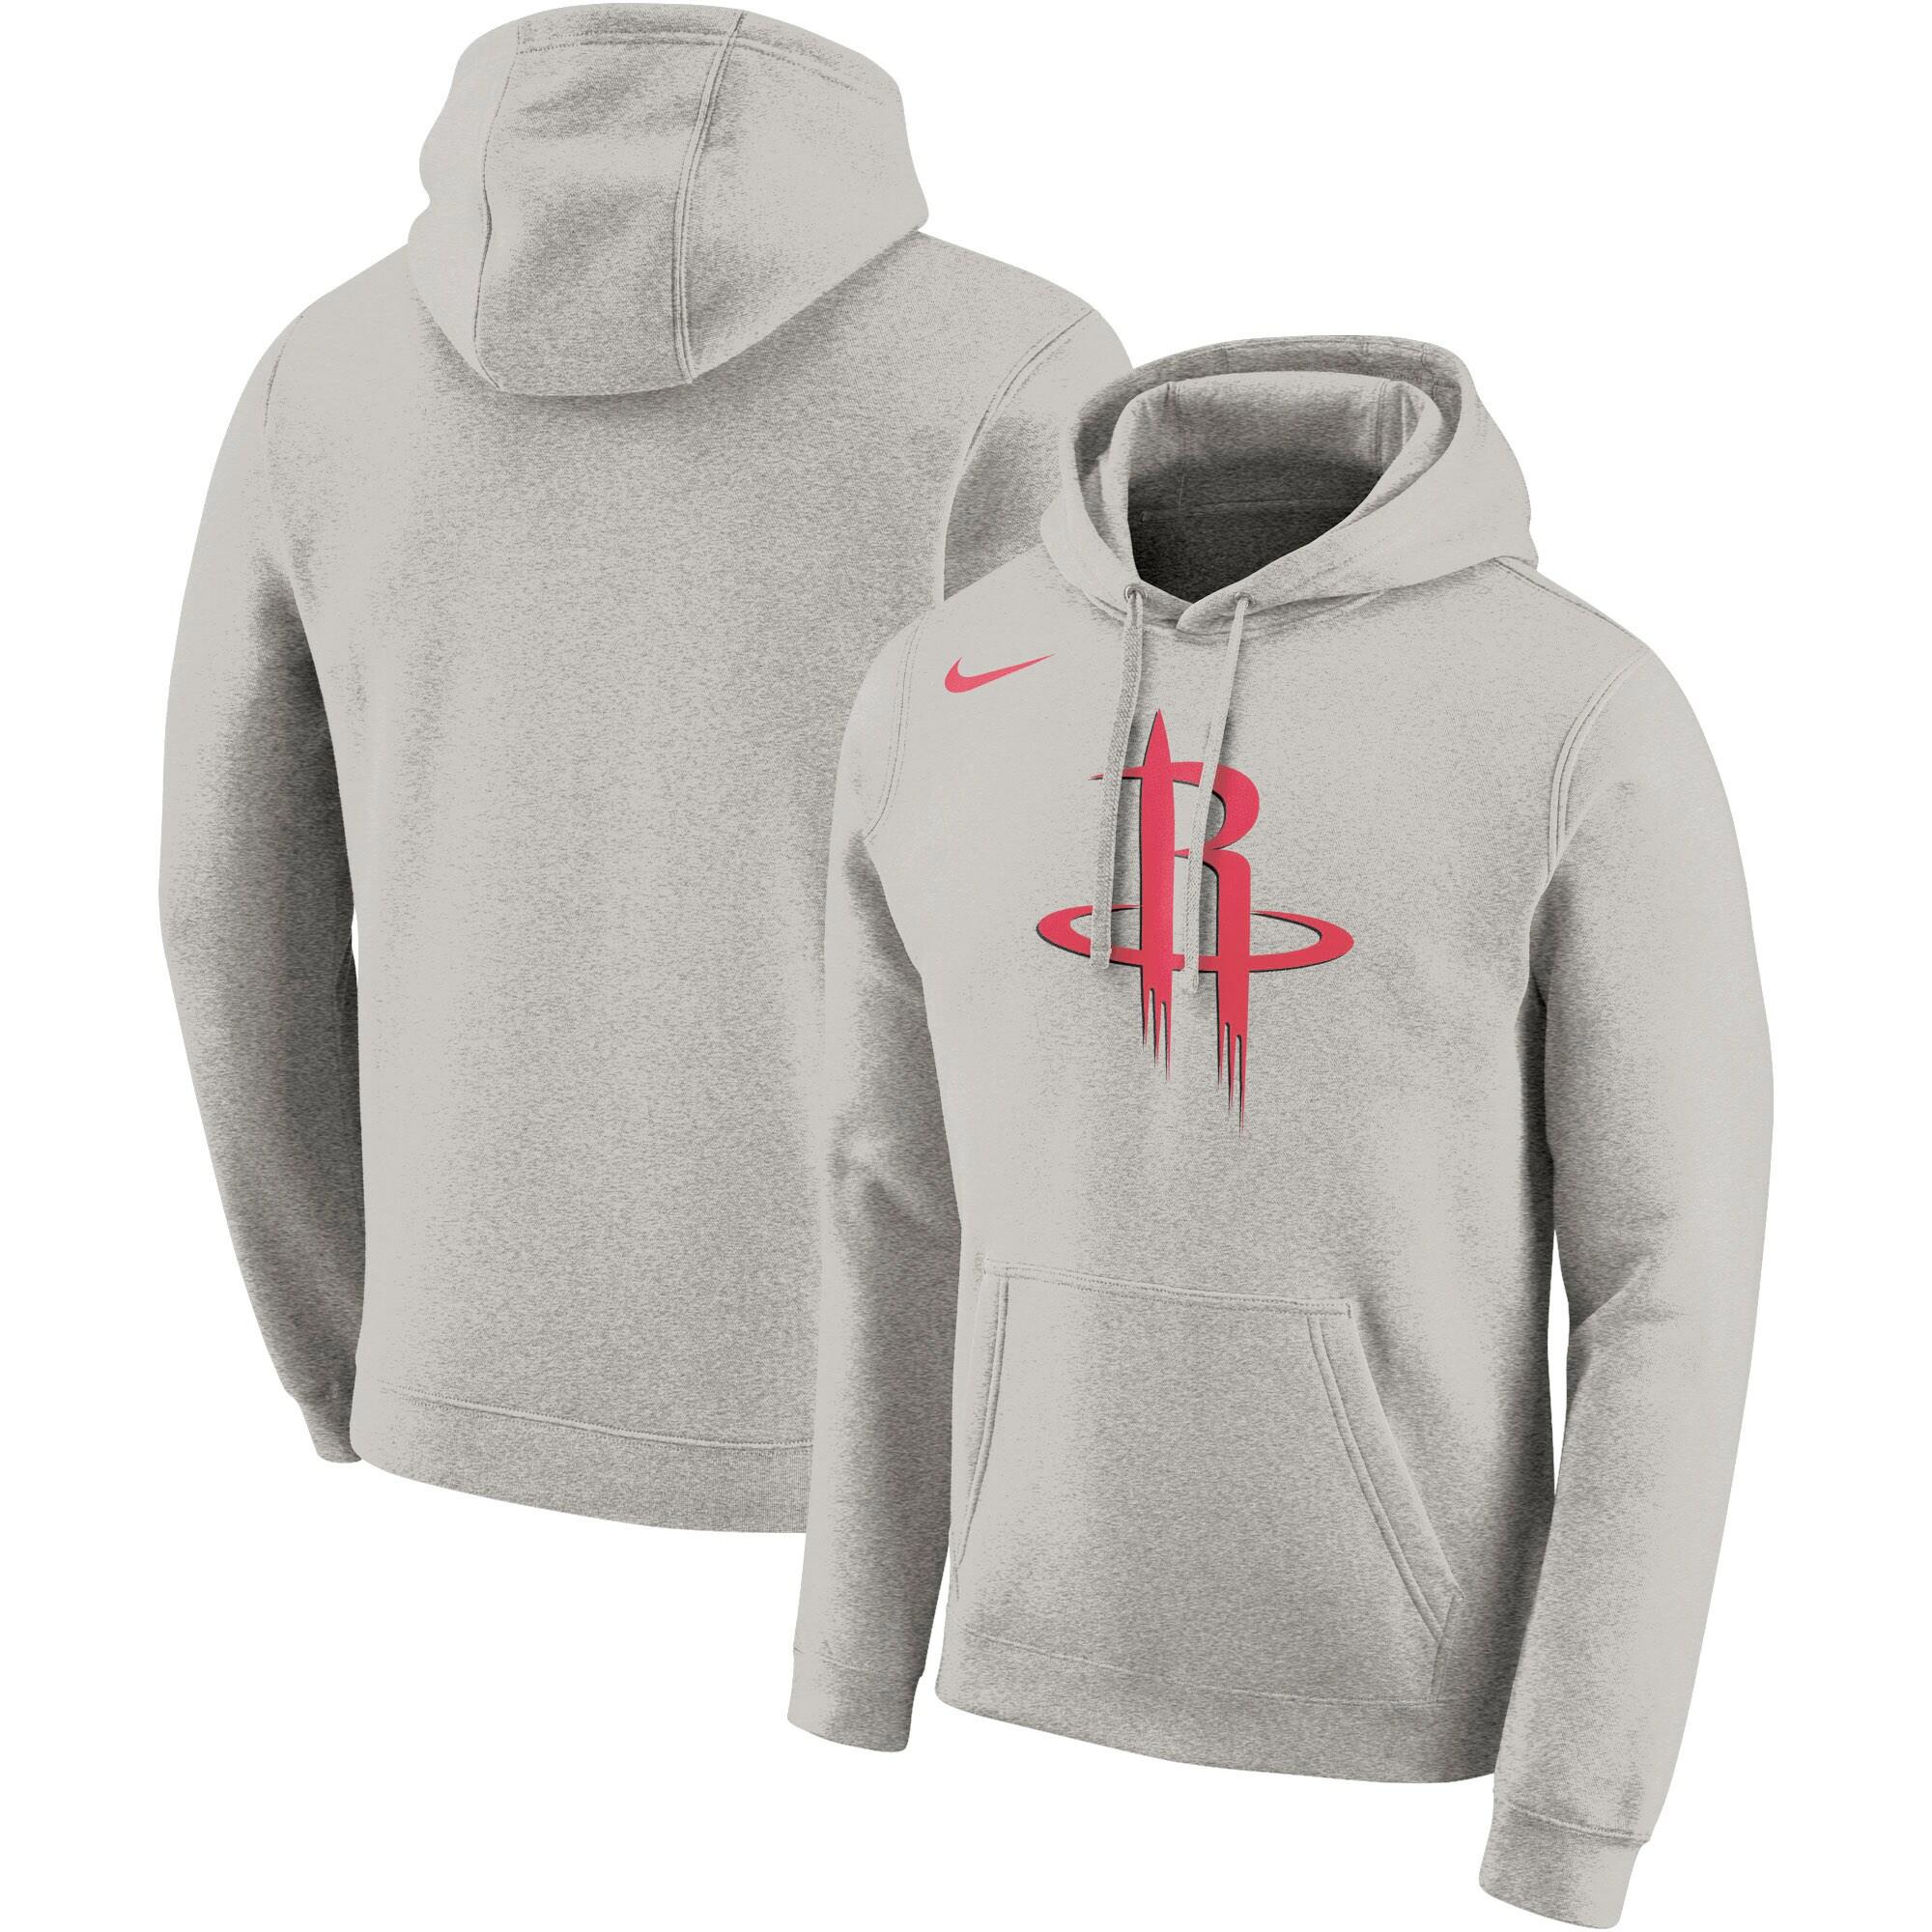 Houston Rockets Nike Essential Logo Fleece Pullover Hoodie - Heathered Gray